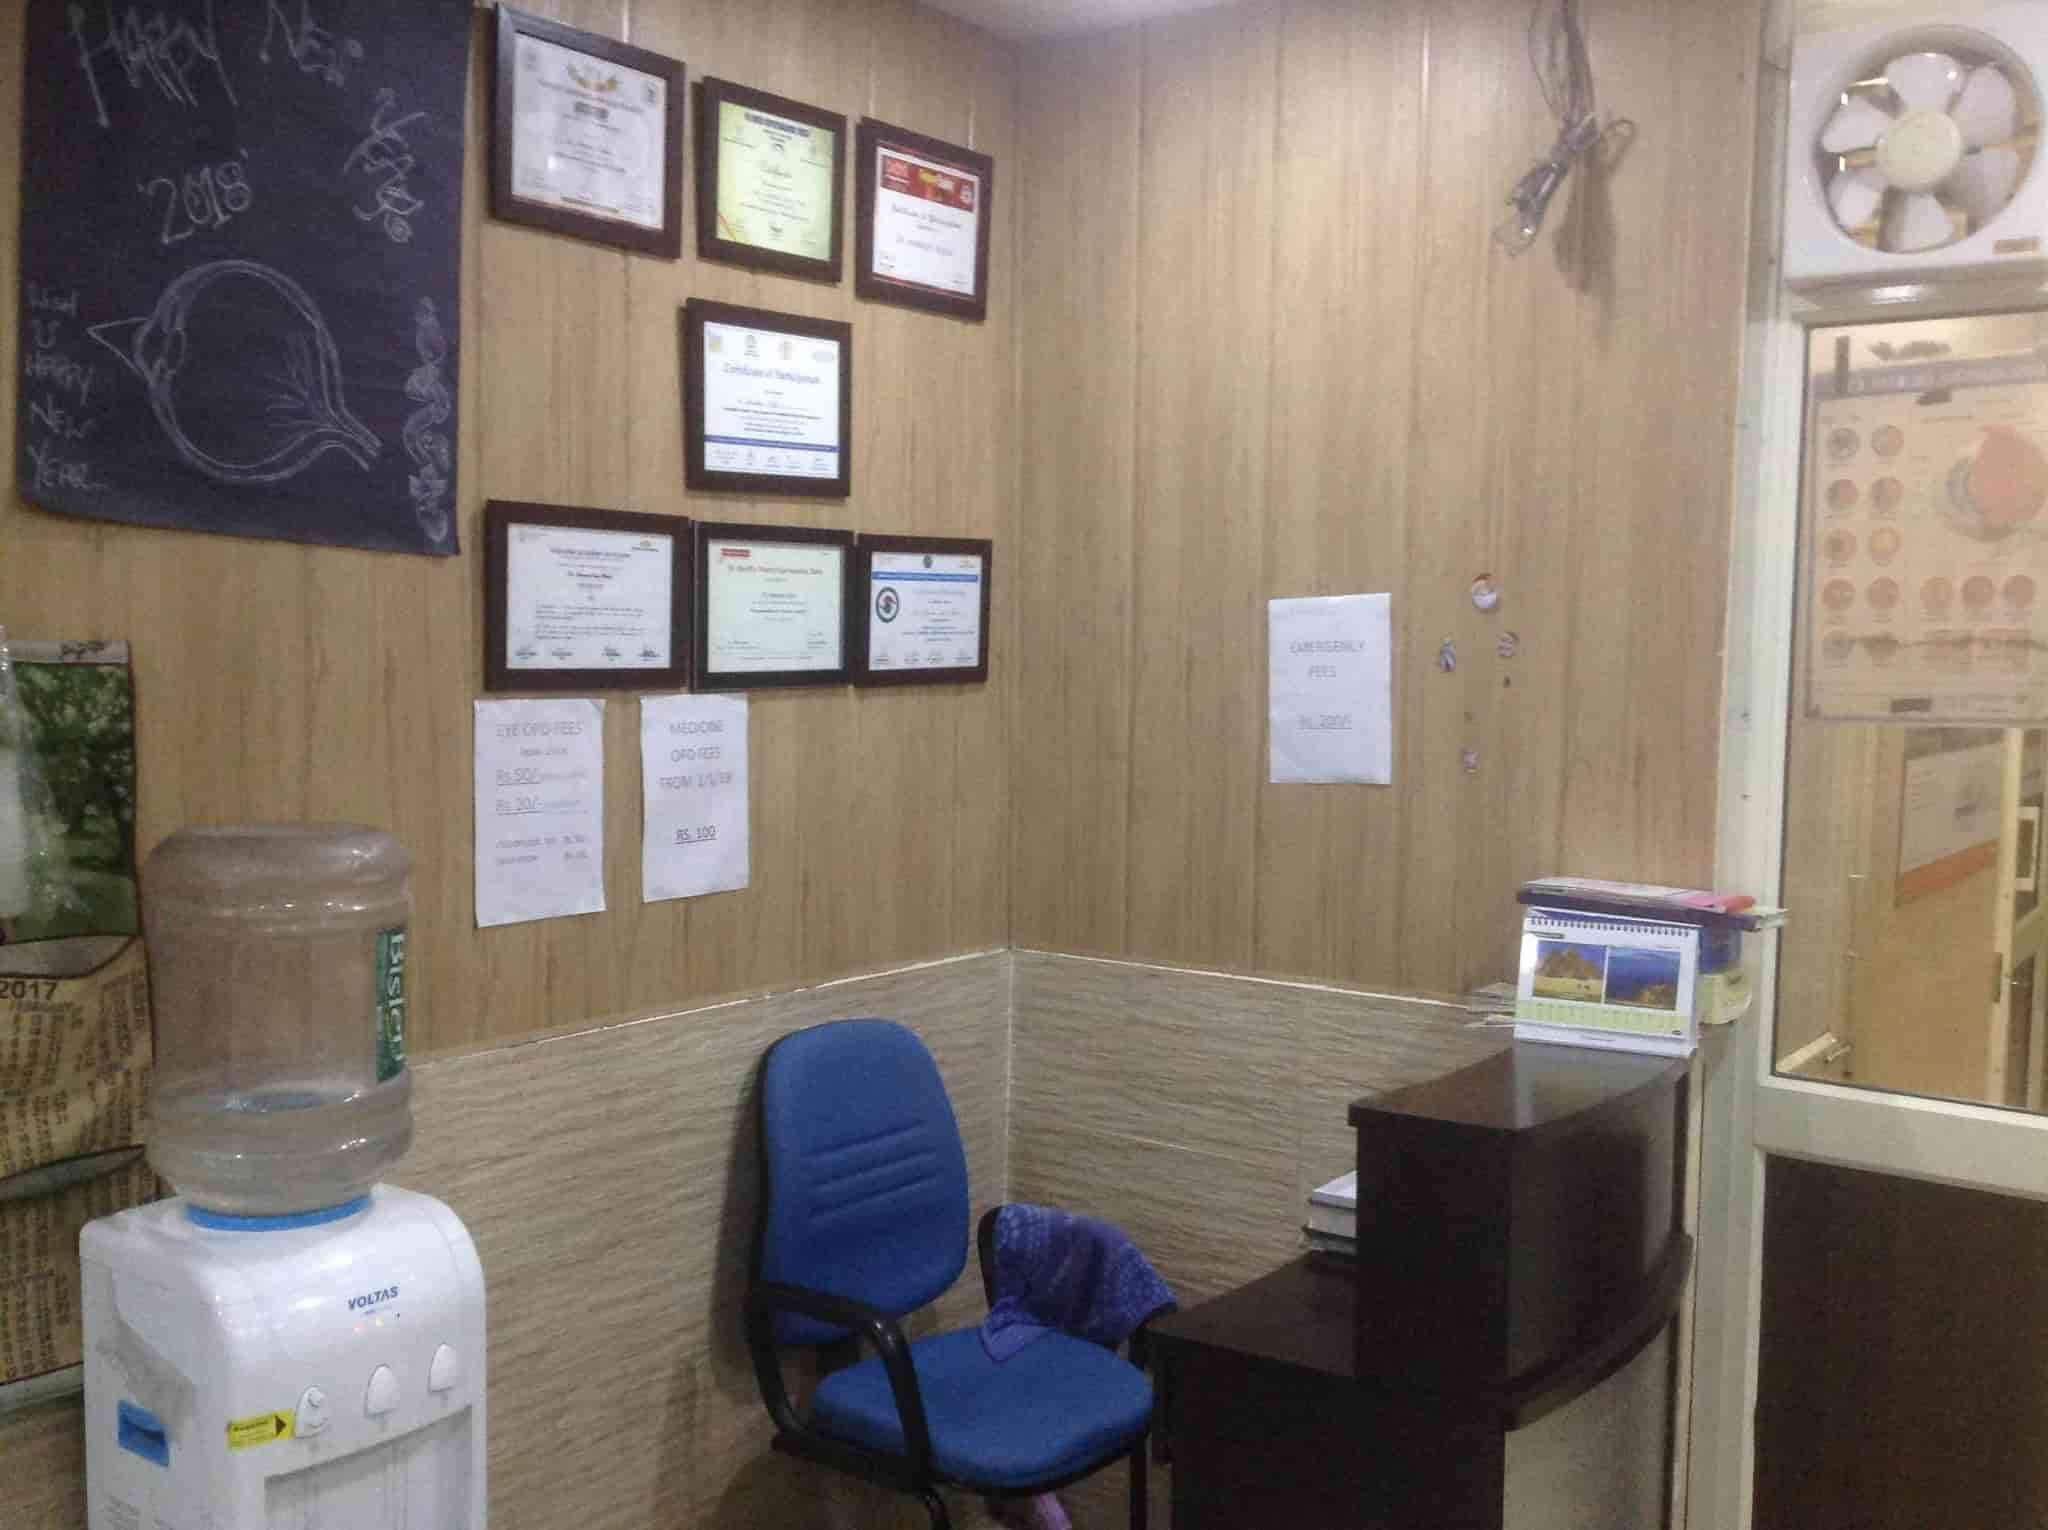 hunar hospital and eye care centre basti jodhewal general